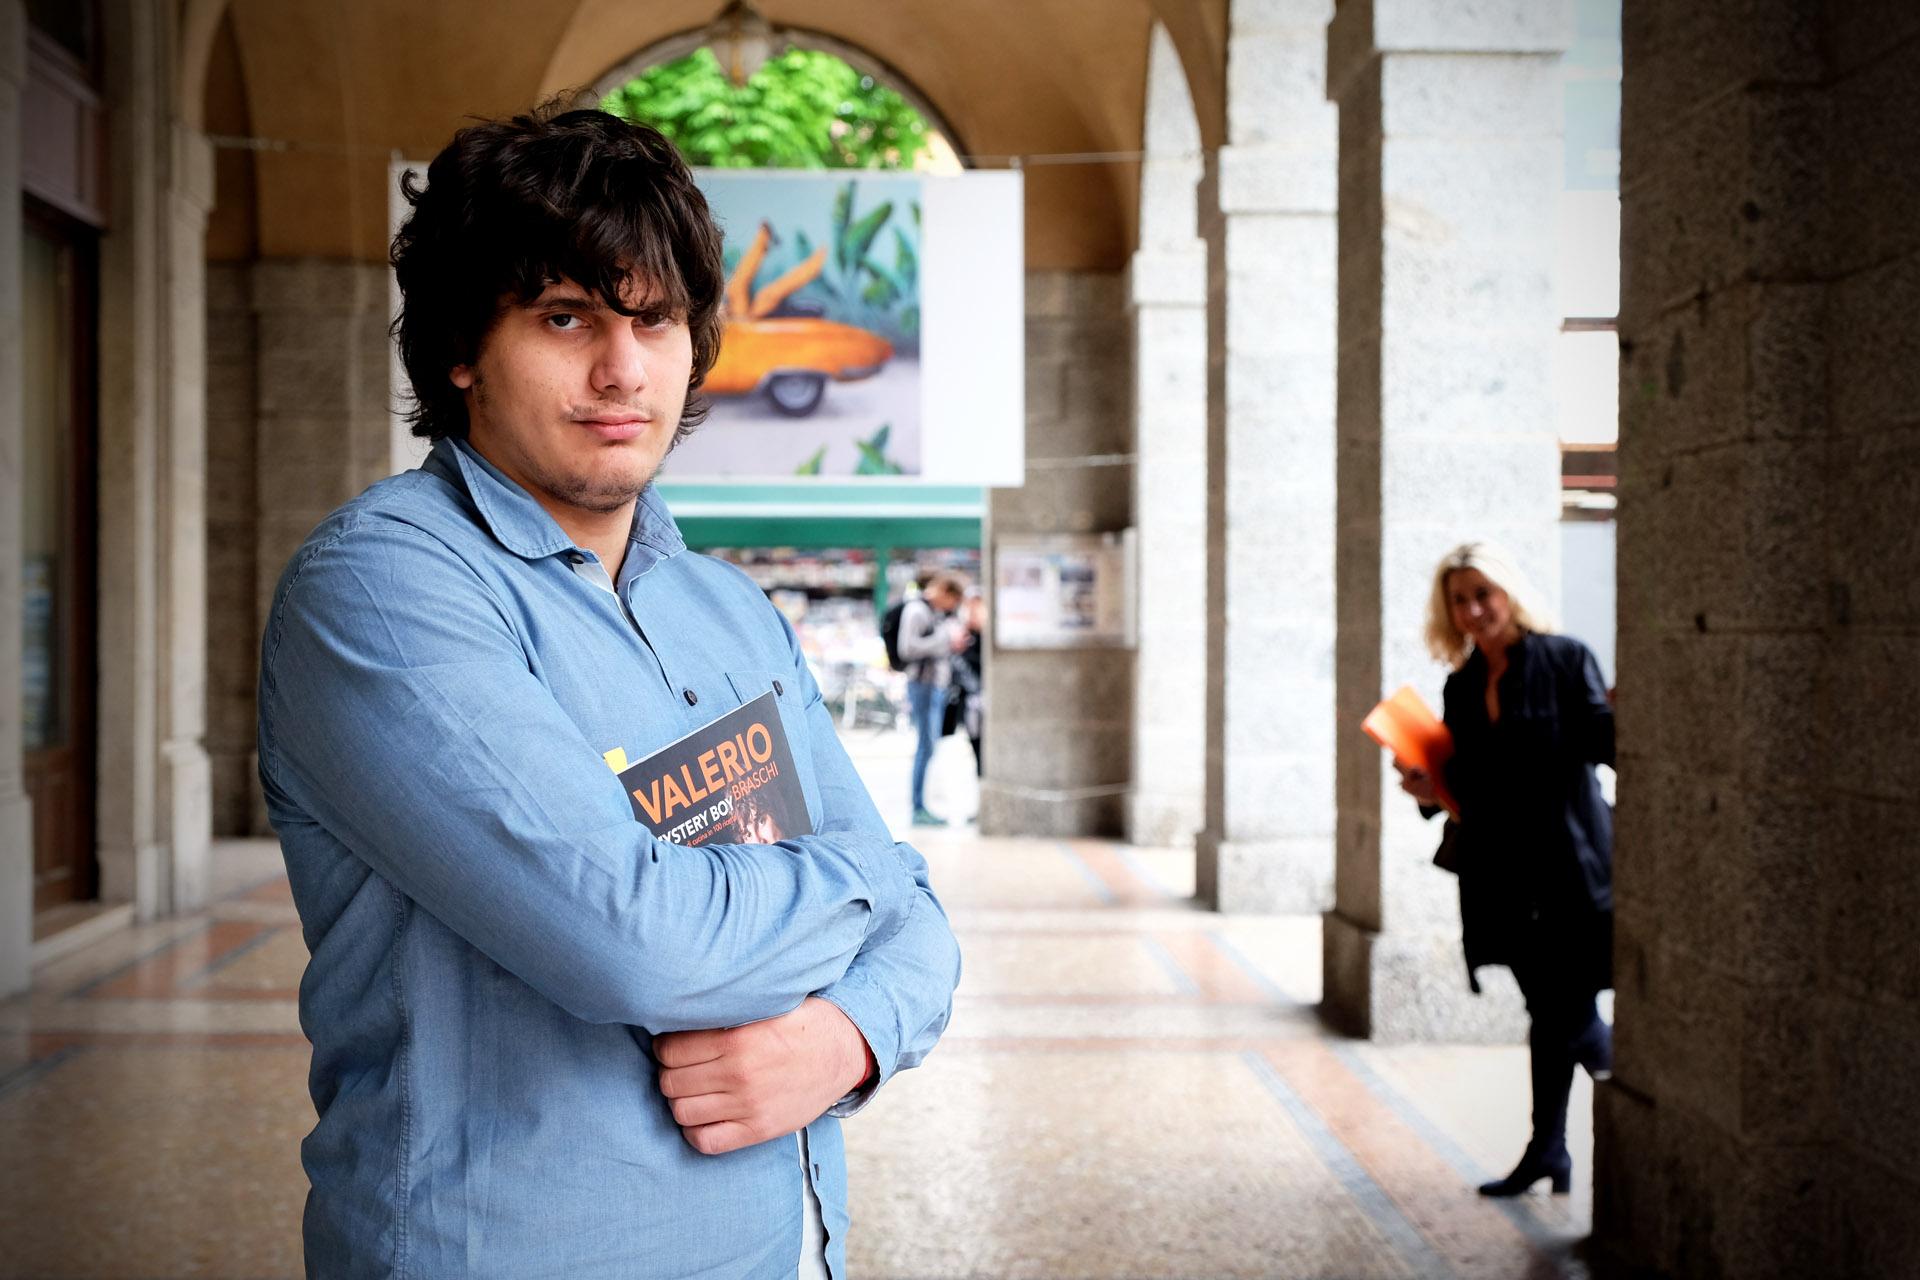 intervista valerio braschi vincitore di masterchef